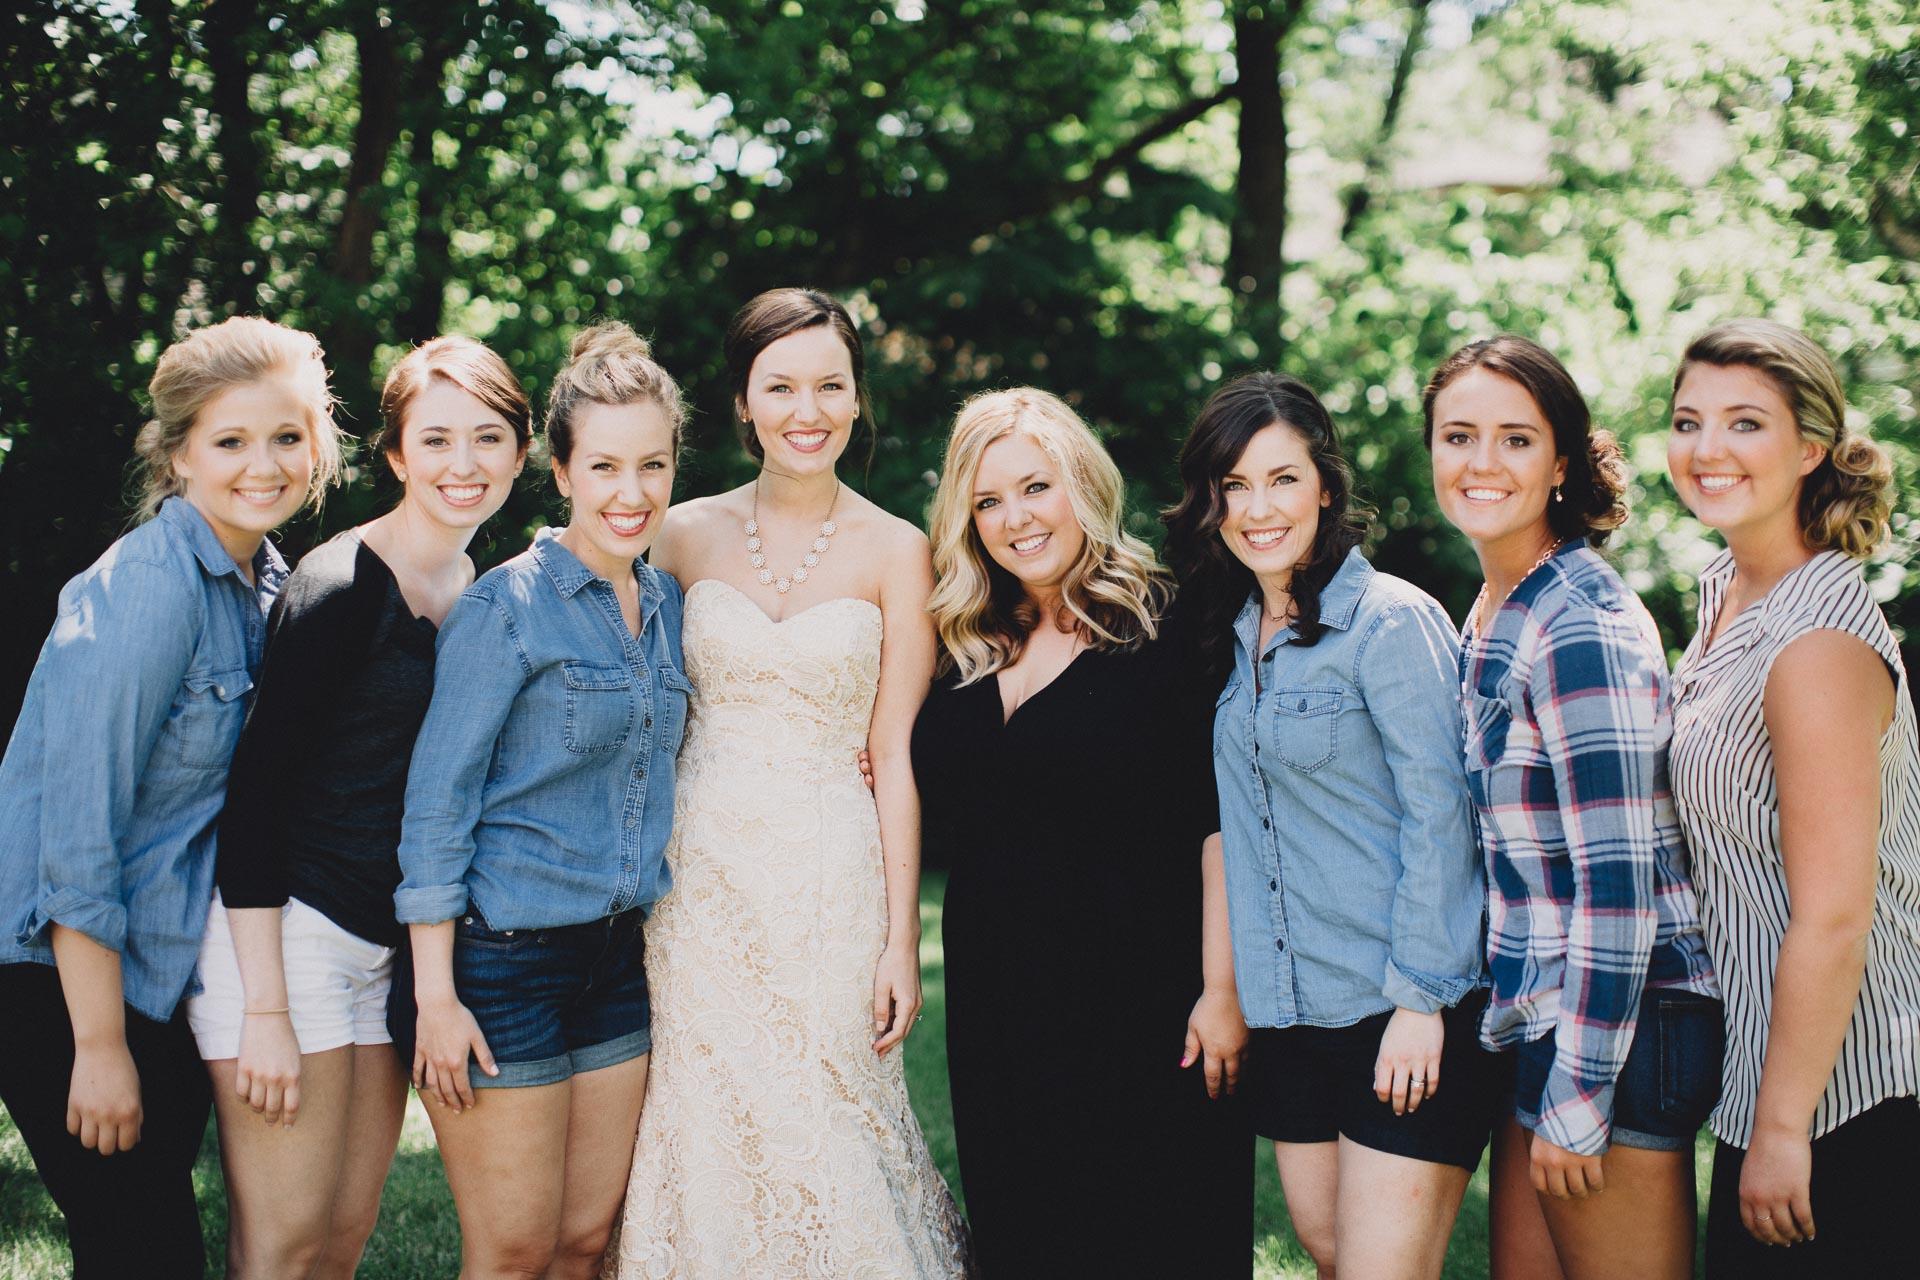 Julia-Michael-Cincinnati-Music-Hall-Wedding-032@2x.jpg